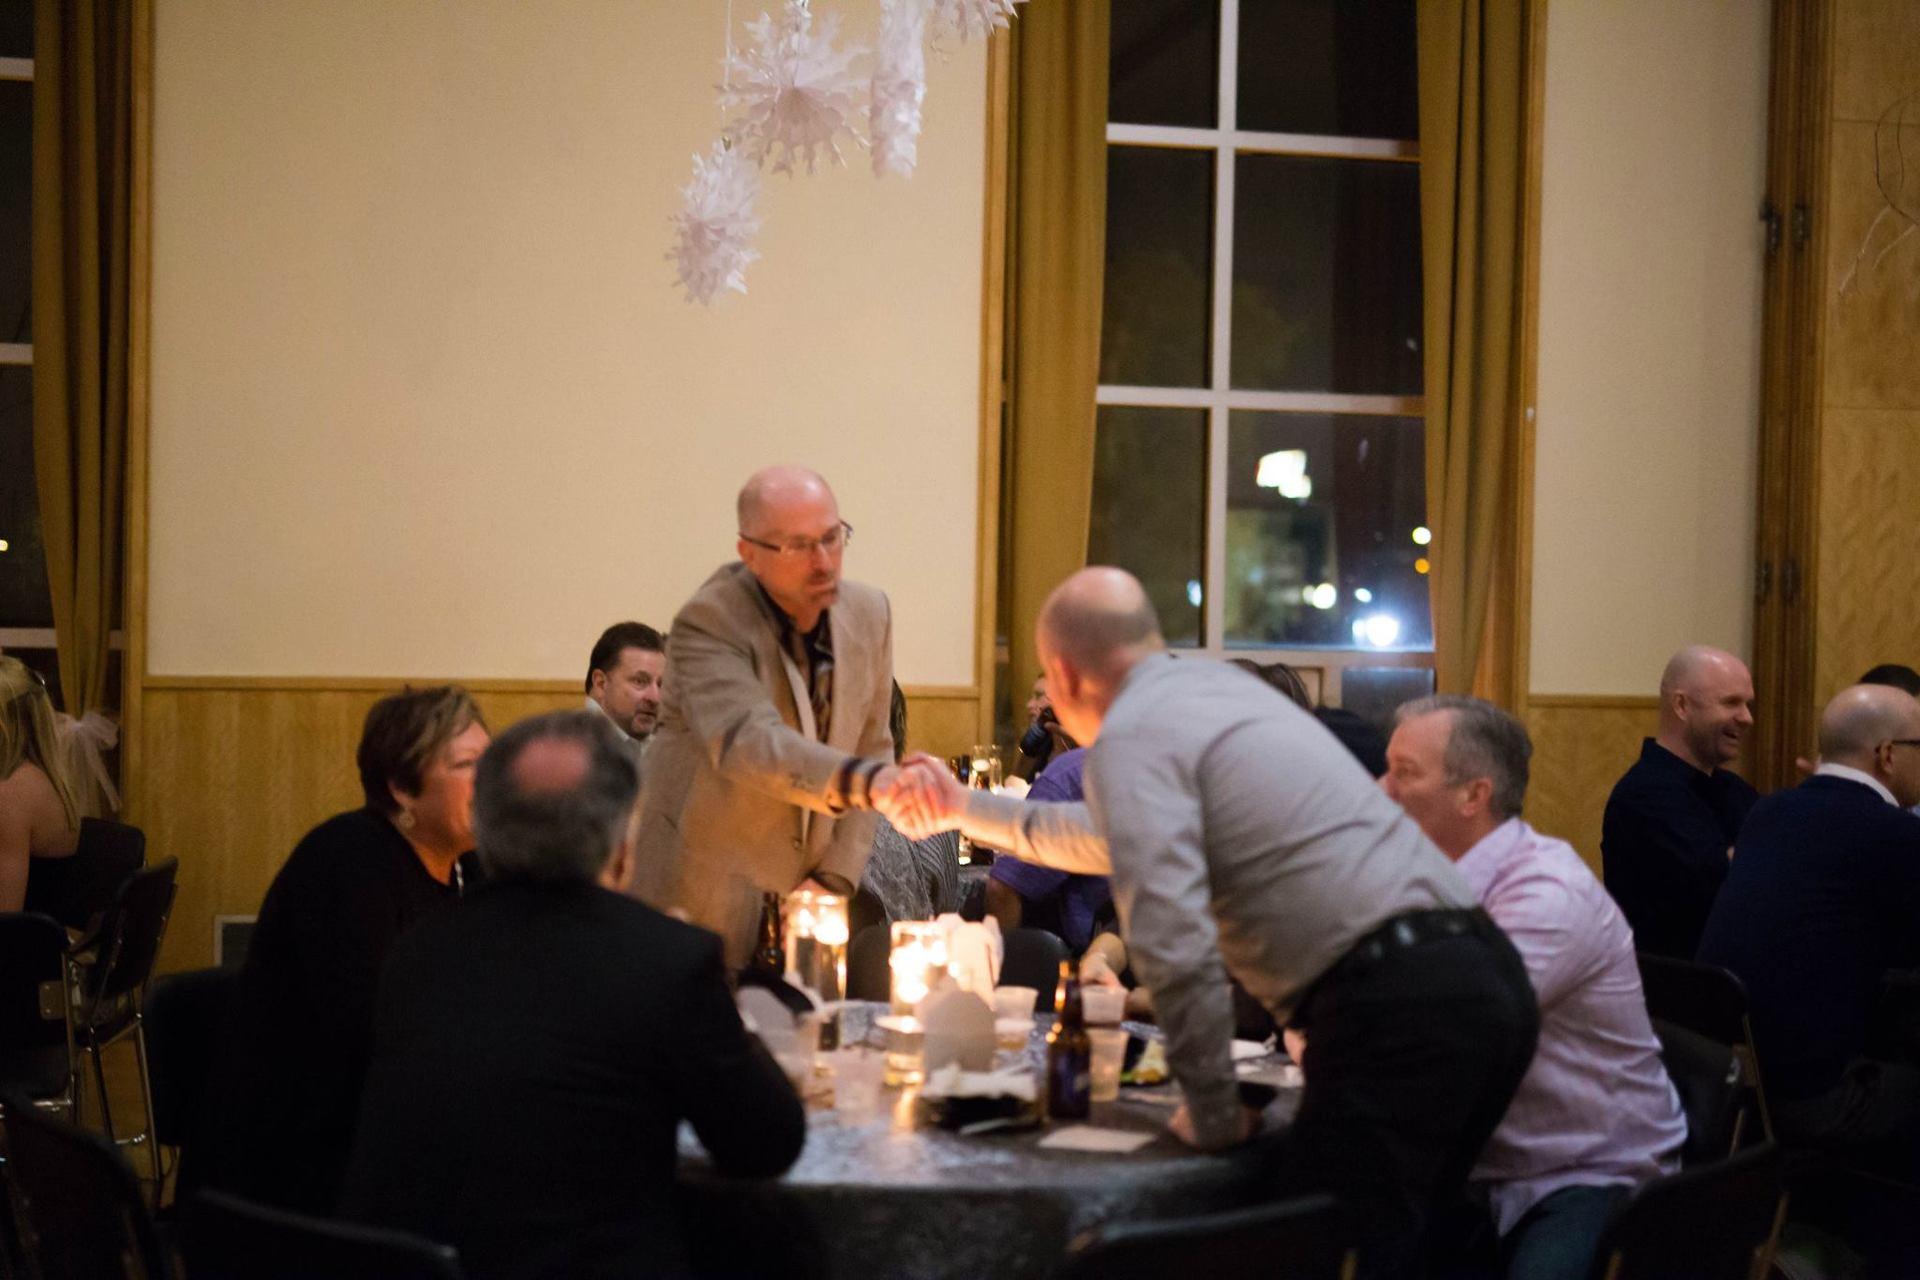 Winter Blues Dinner and Fundraiser